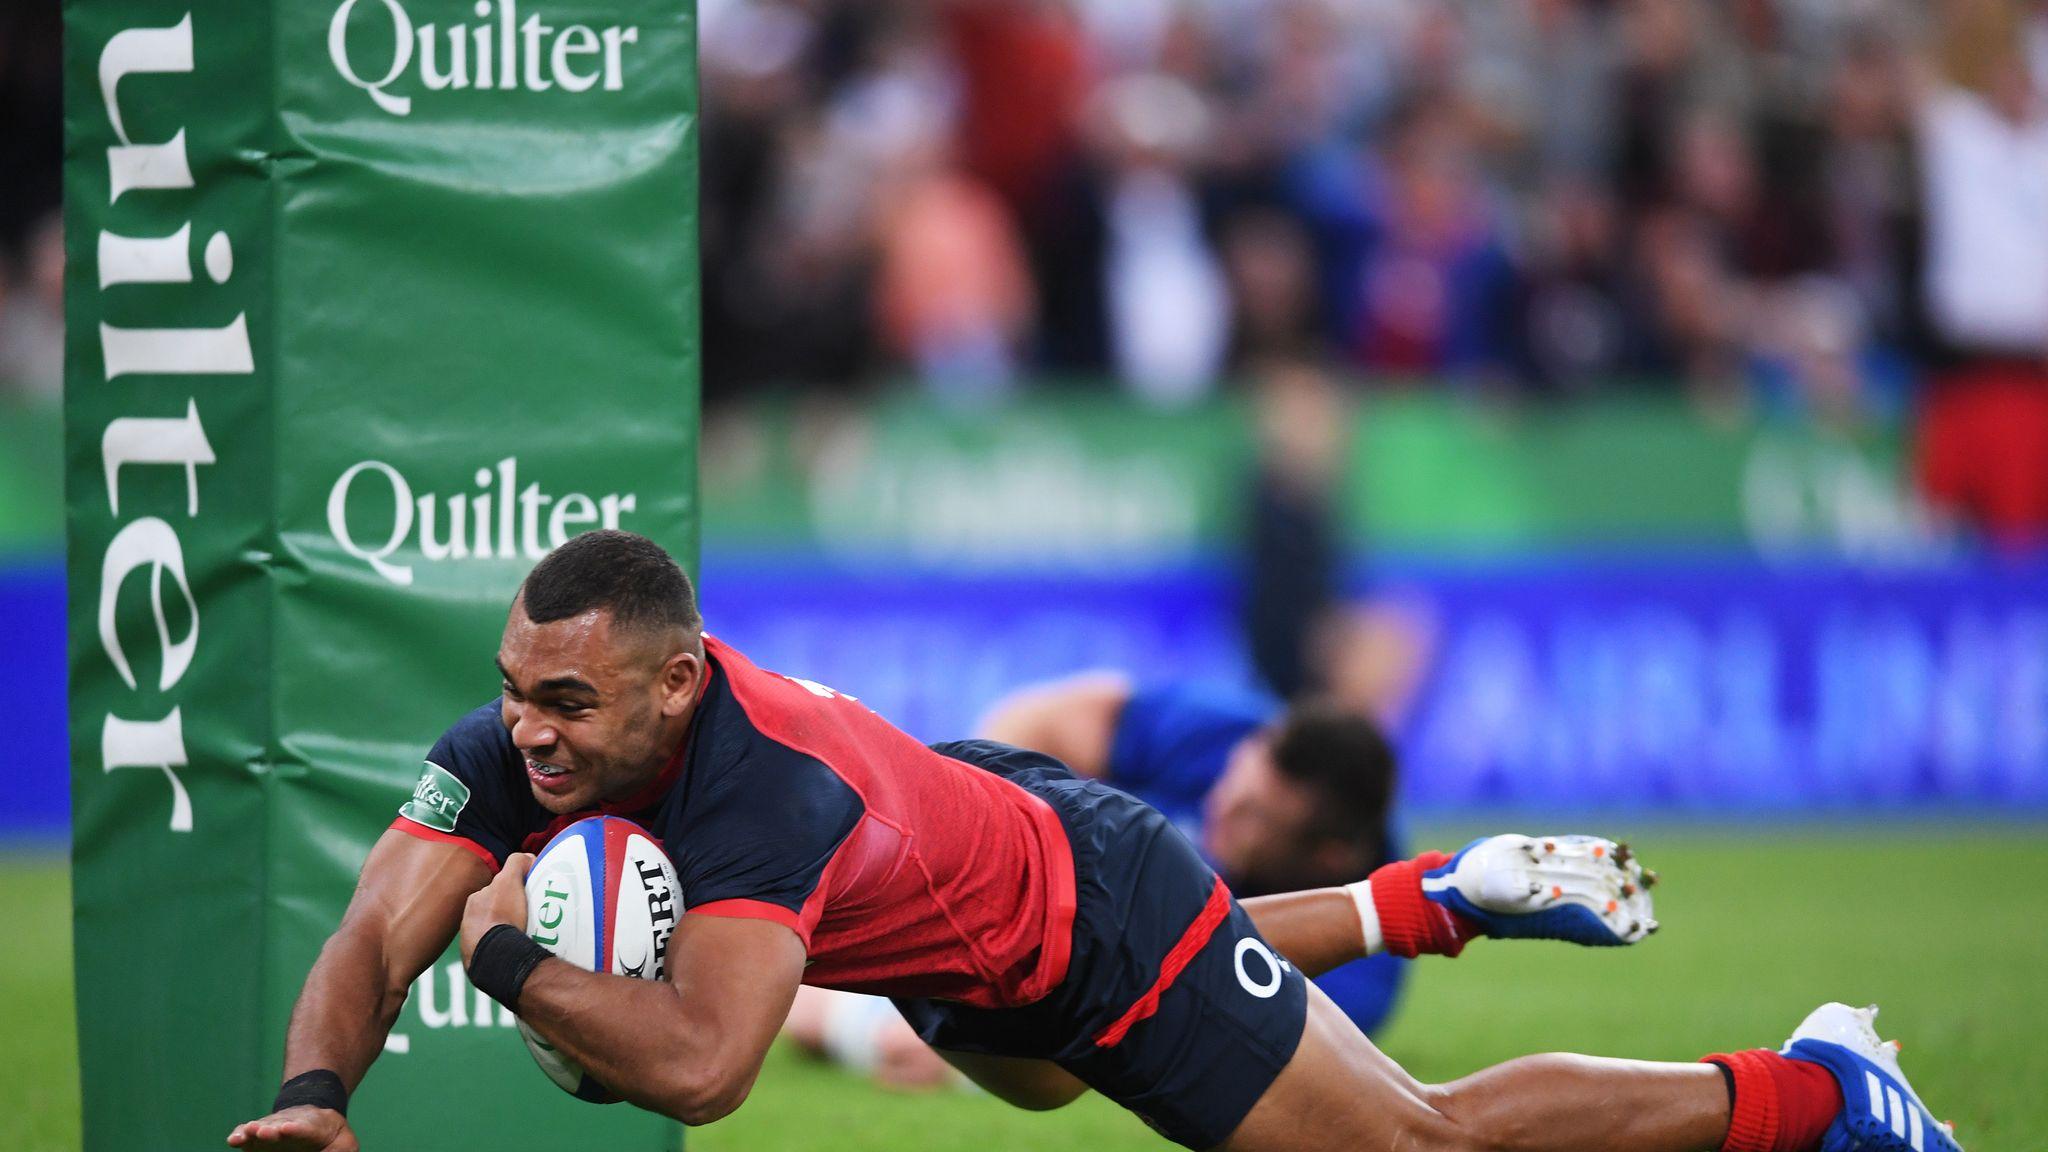 Joe Marchant to leave Harlequins for Super Rugby sabbatical